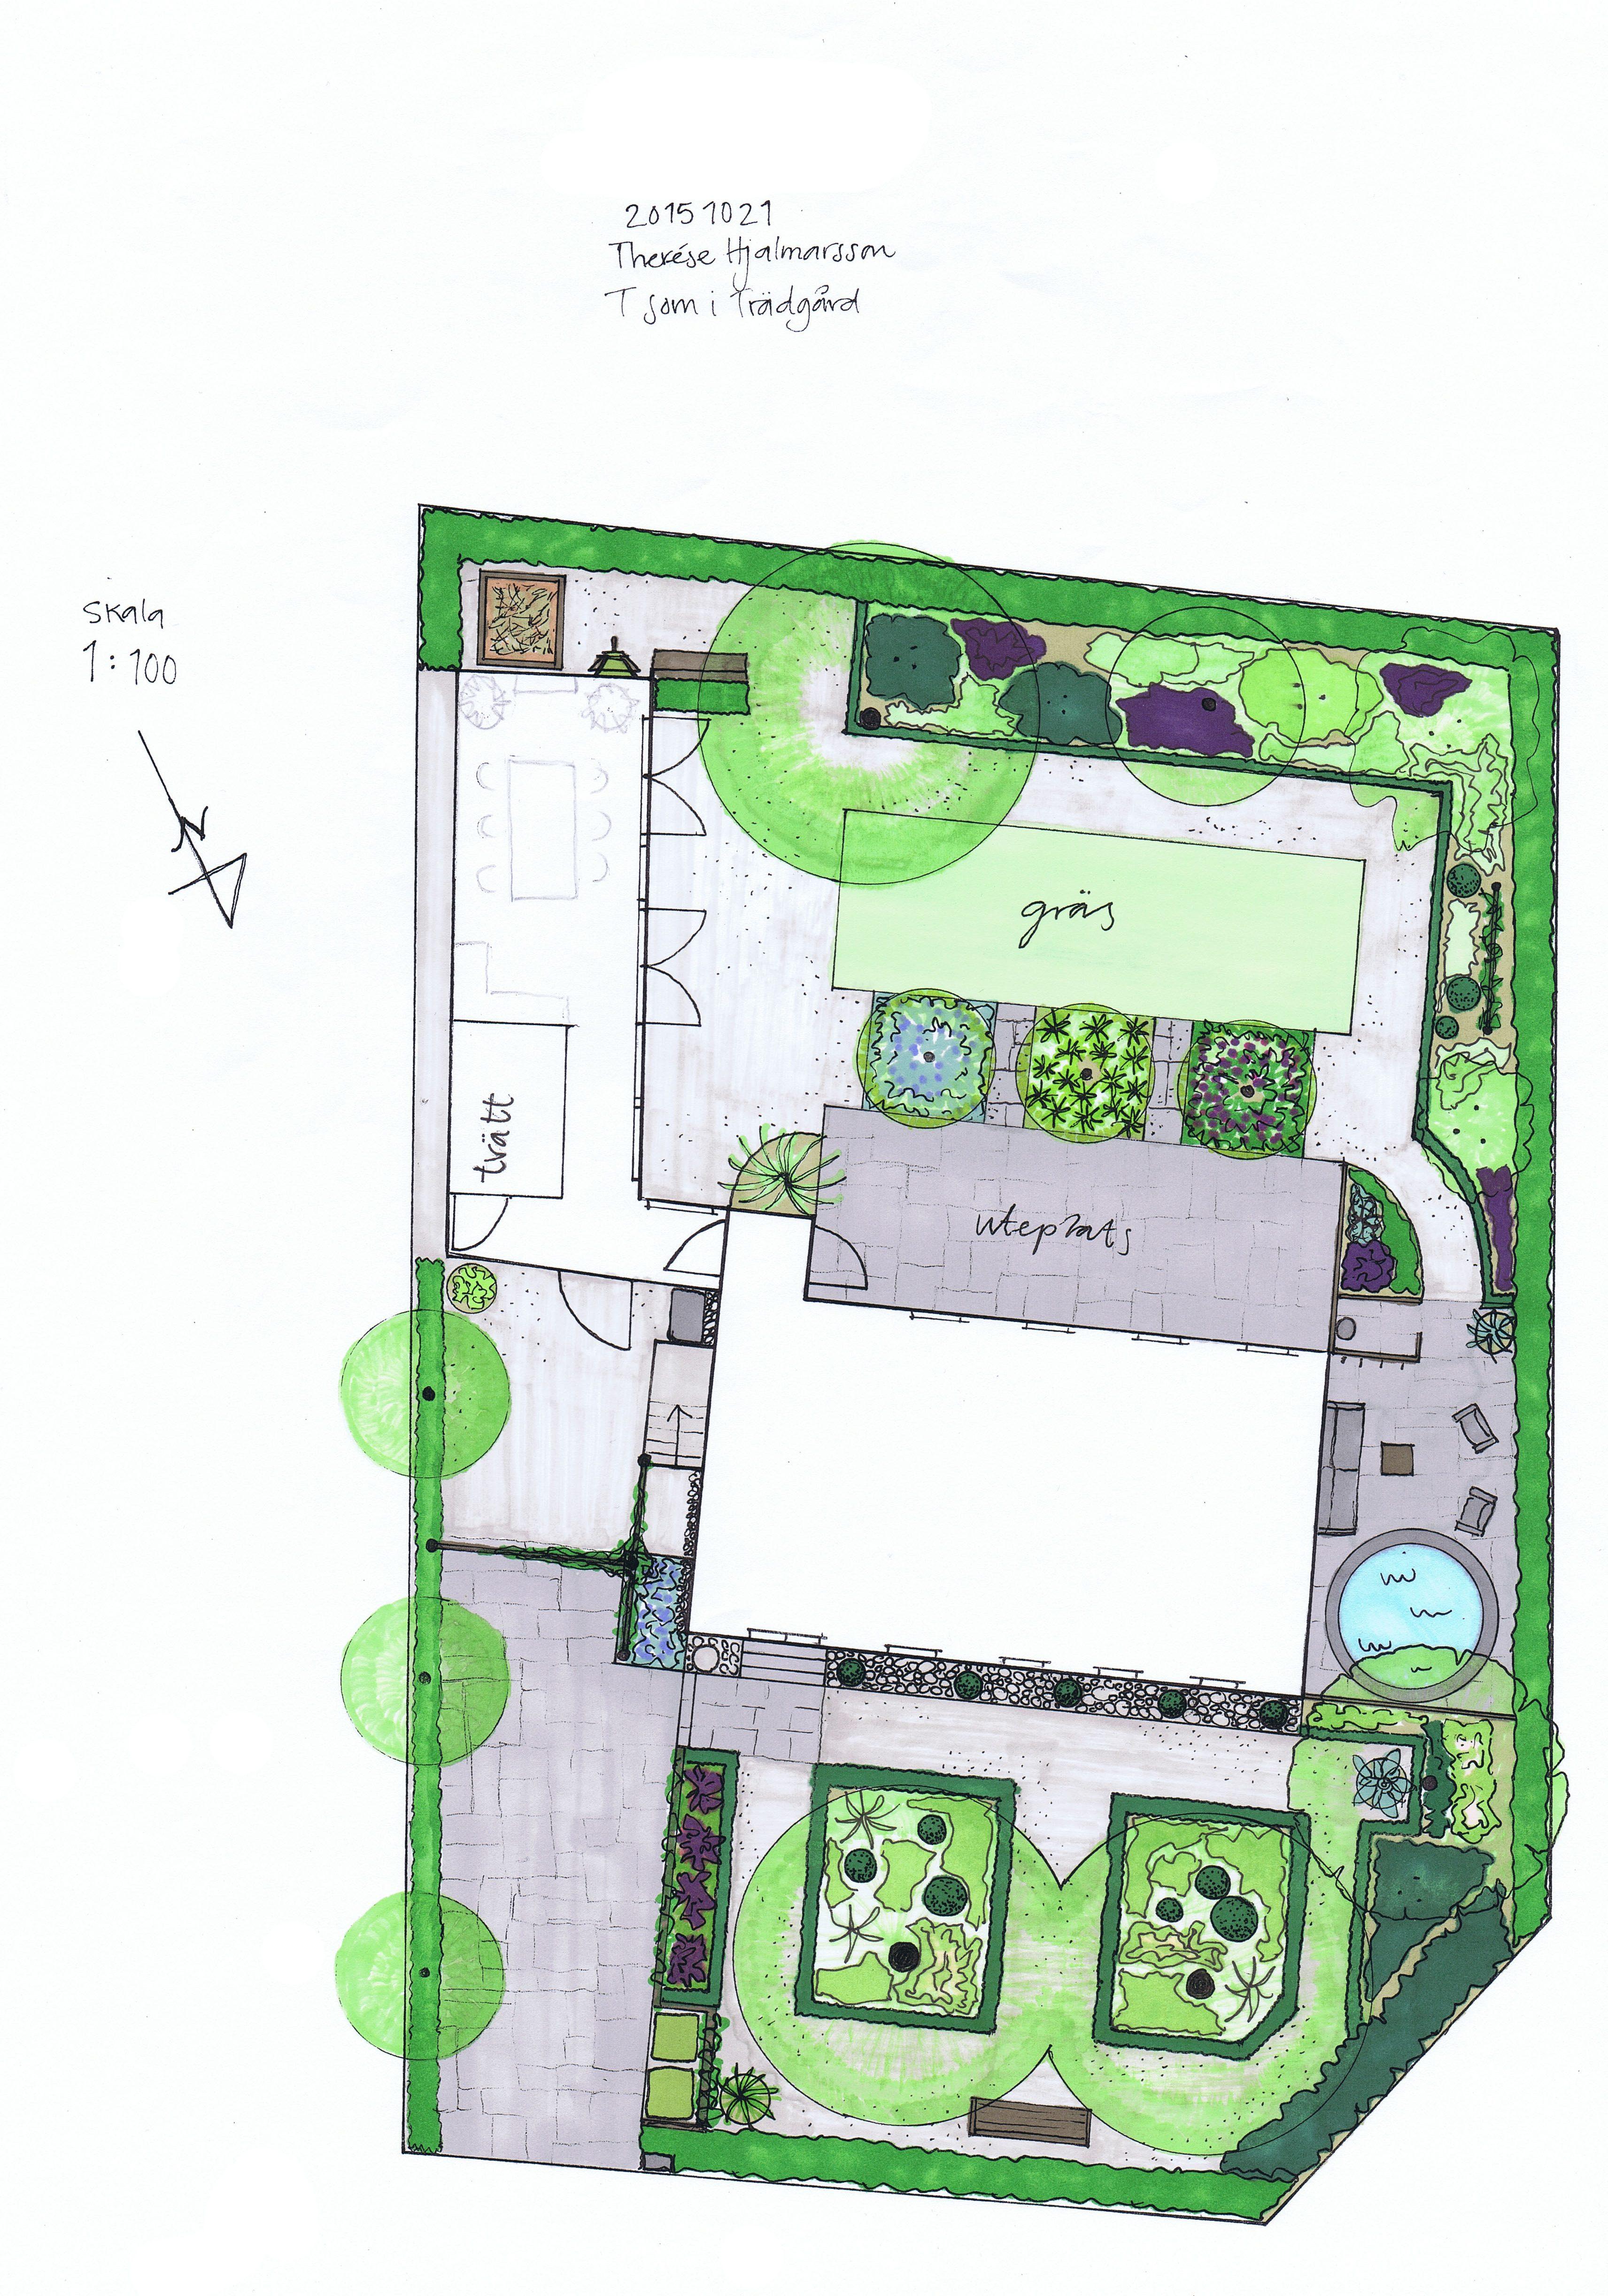 Trädgårdsdesign, Trädgårdsarkitektur, Klassiskt trädgård, entréträdgård